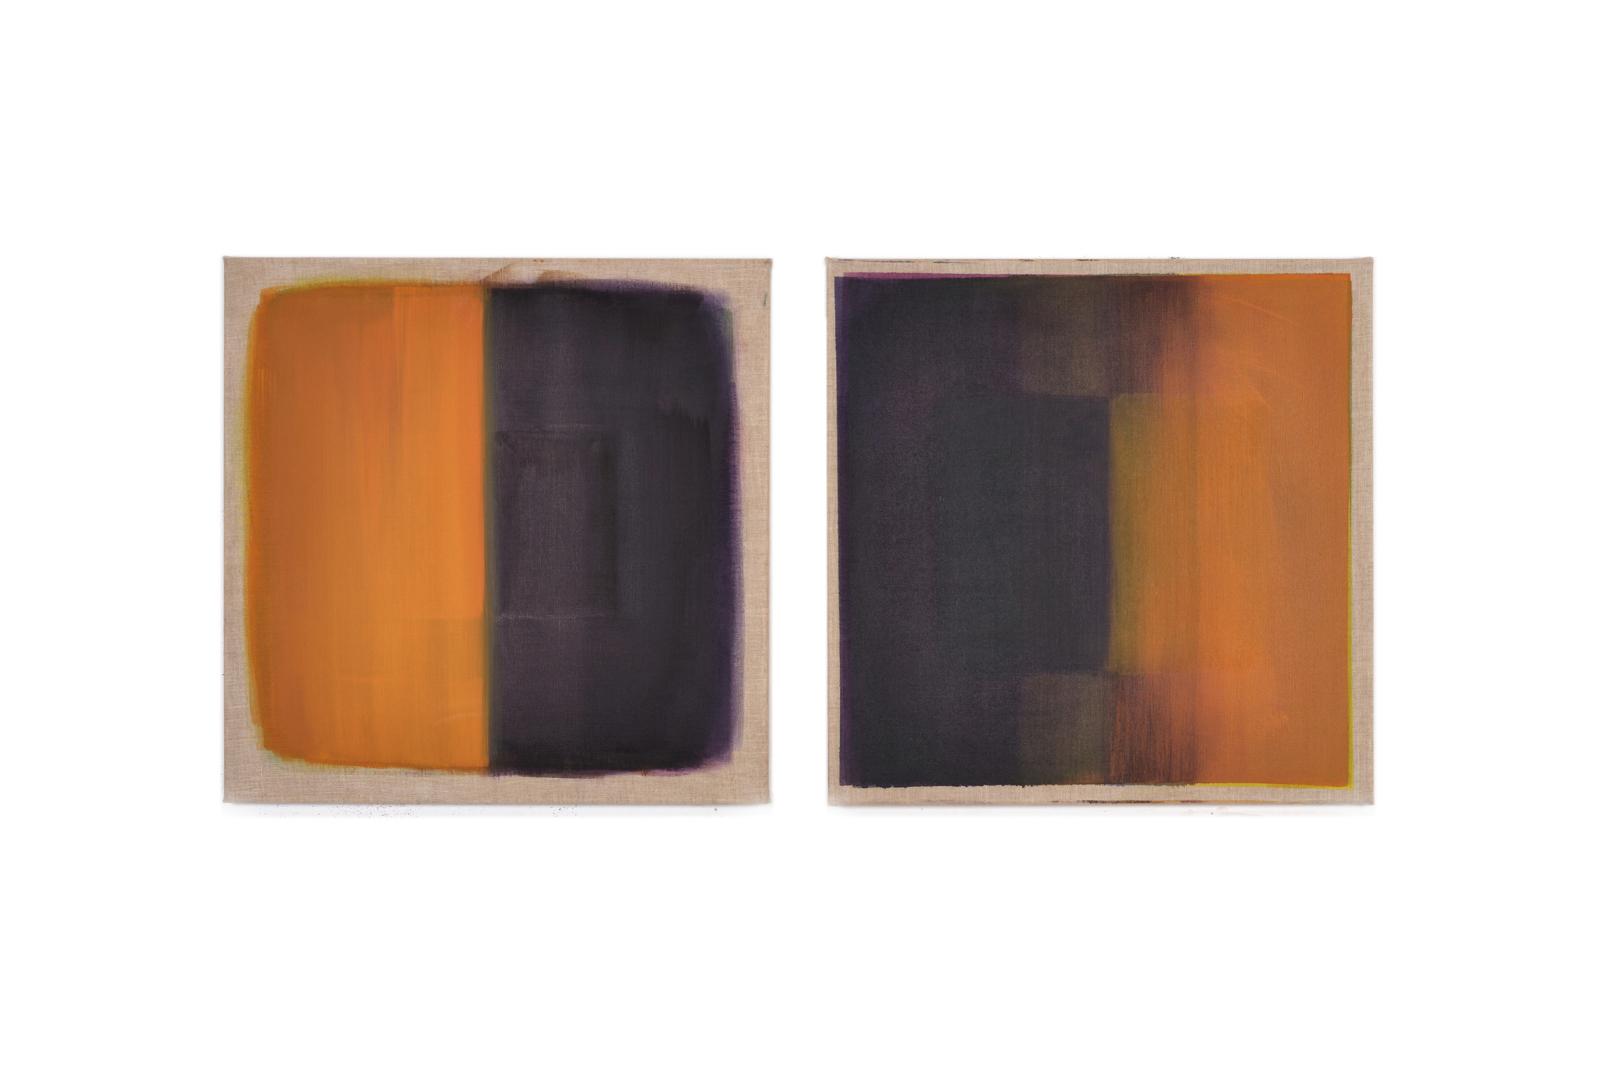 Wechsel, 2018, 2 Tafeln je 60x60 | cambio, 2 tavole cad. 60x60